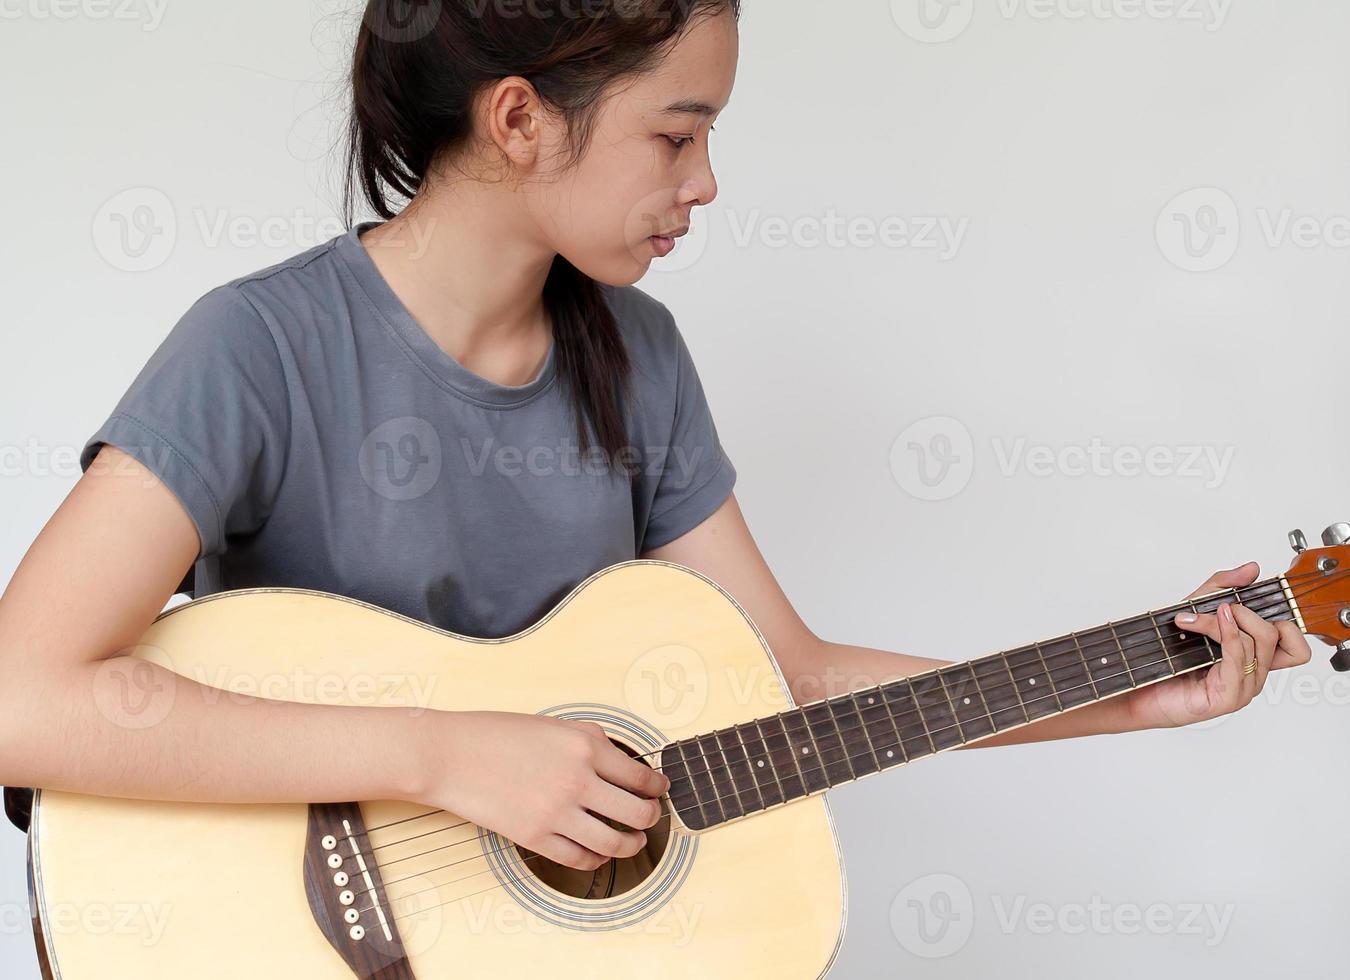 jolie fille pratiquant la guitare. photo